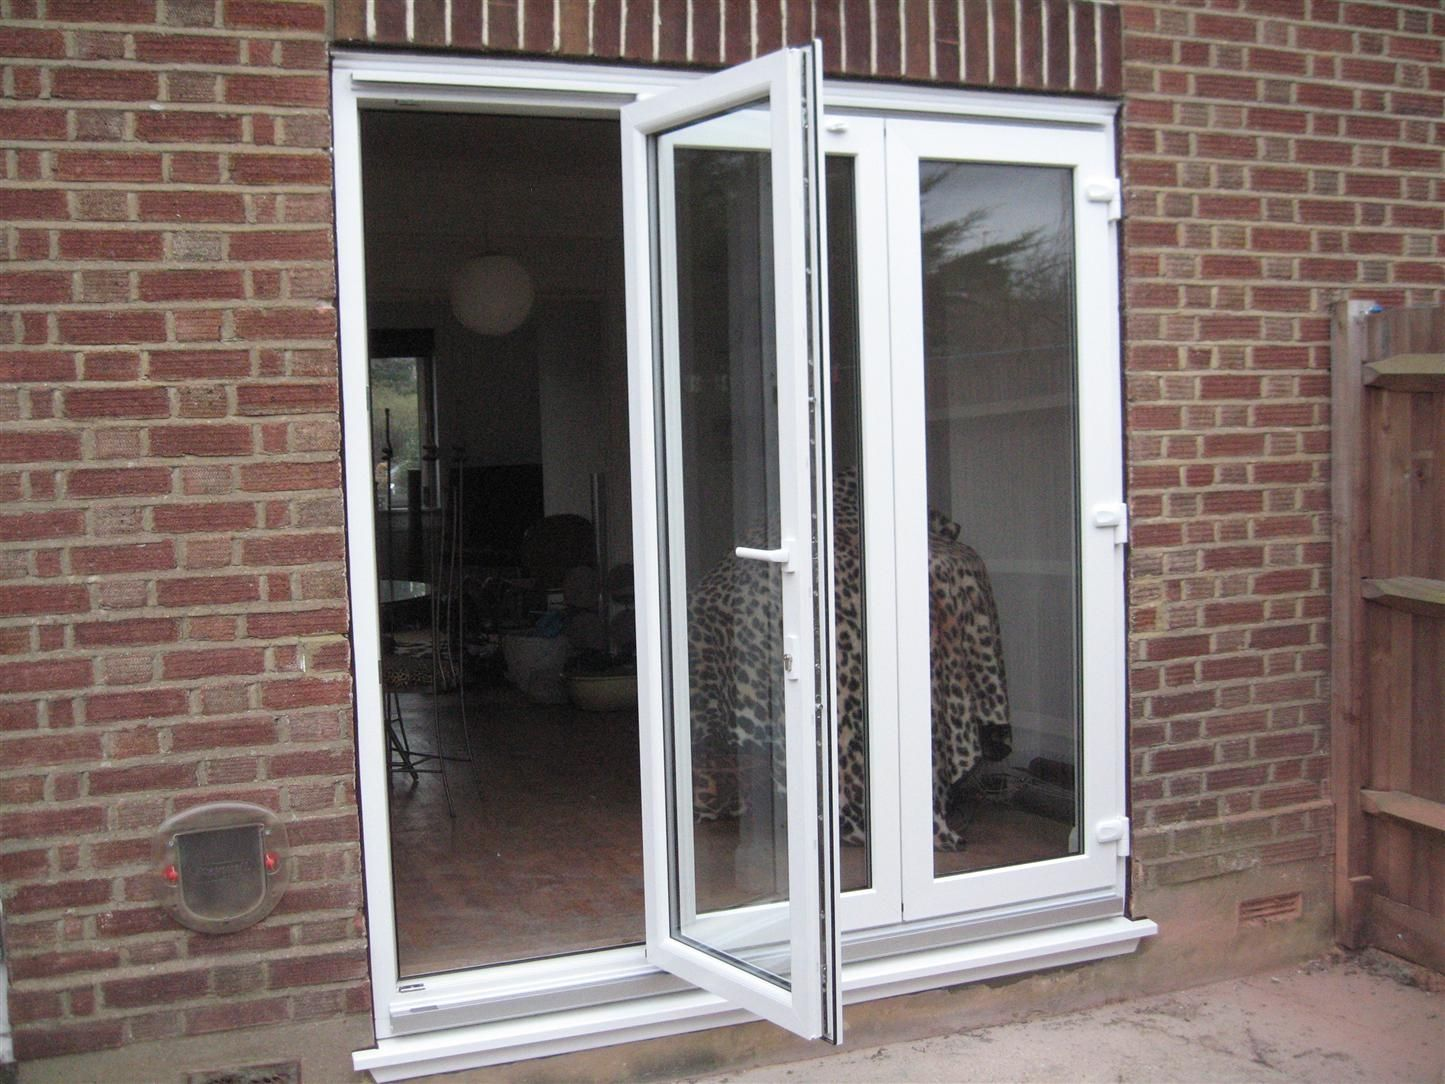 folding patio doors with screens. tri folding upvc patio doors with screens v & Folding Patio Doors With Screens. Genius Screen ZigZag Folding Patio ...